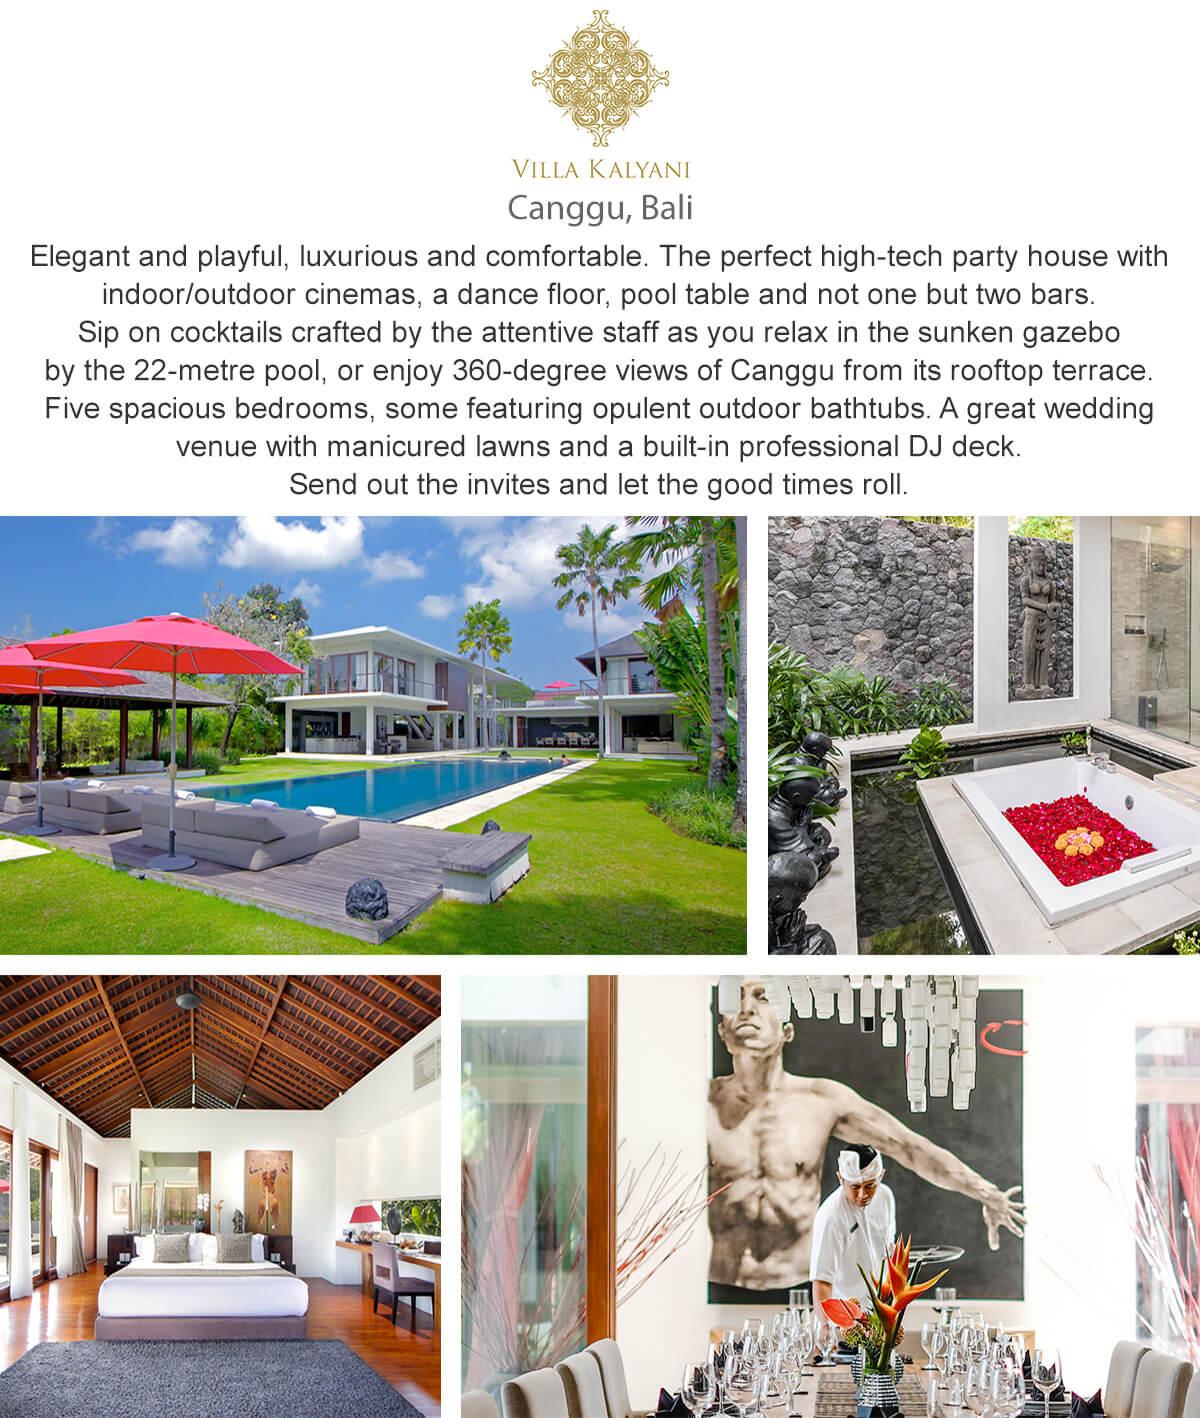 Villa Kalyani - Canggu, Bali